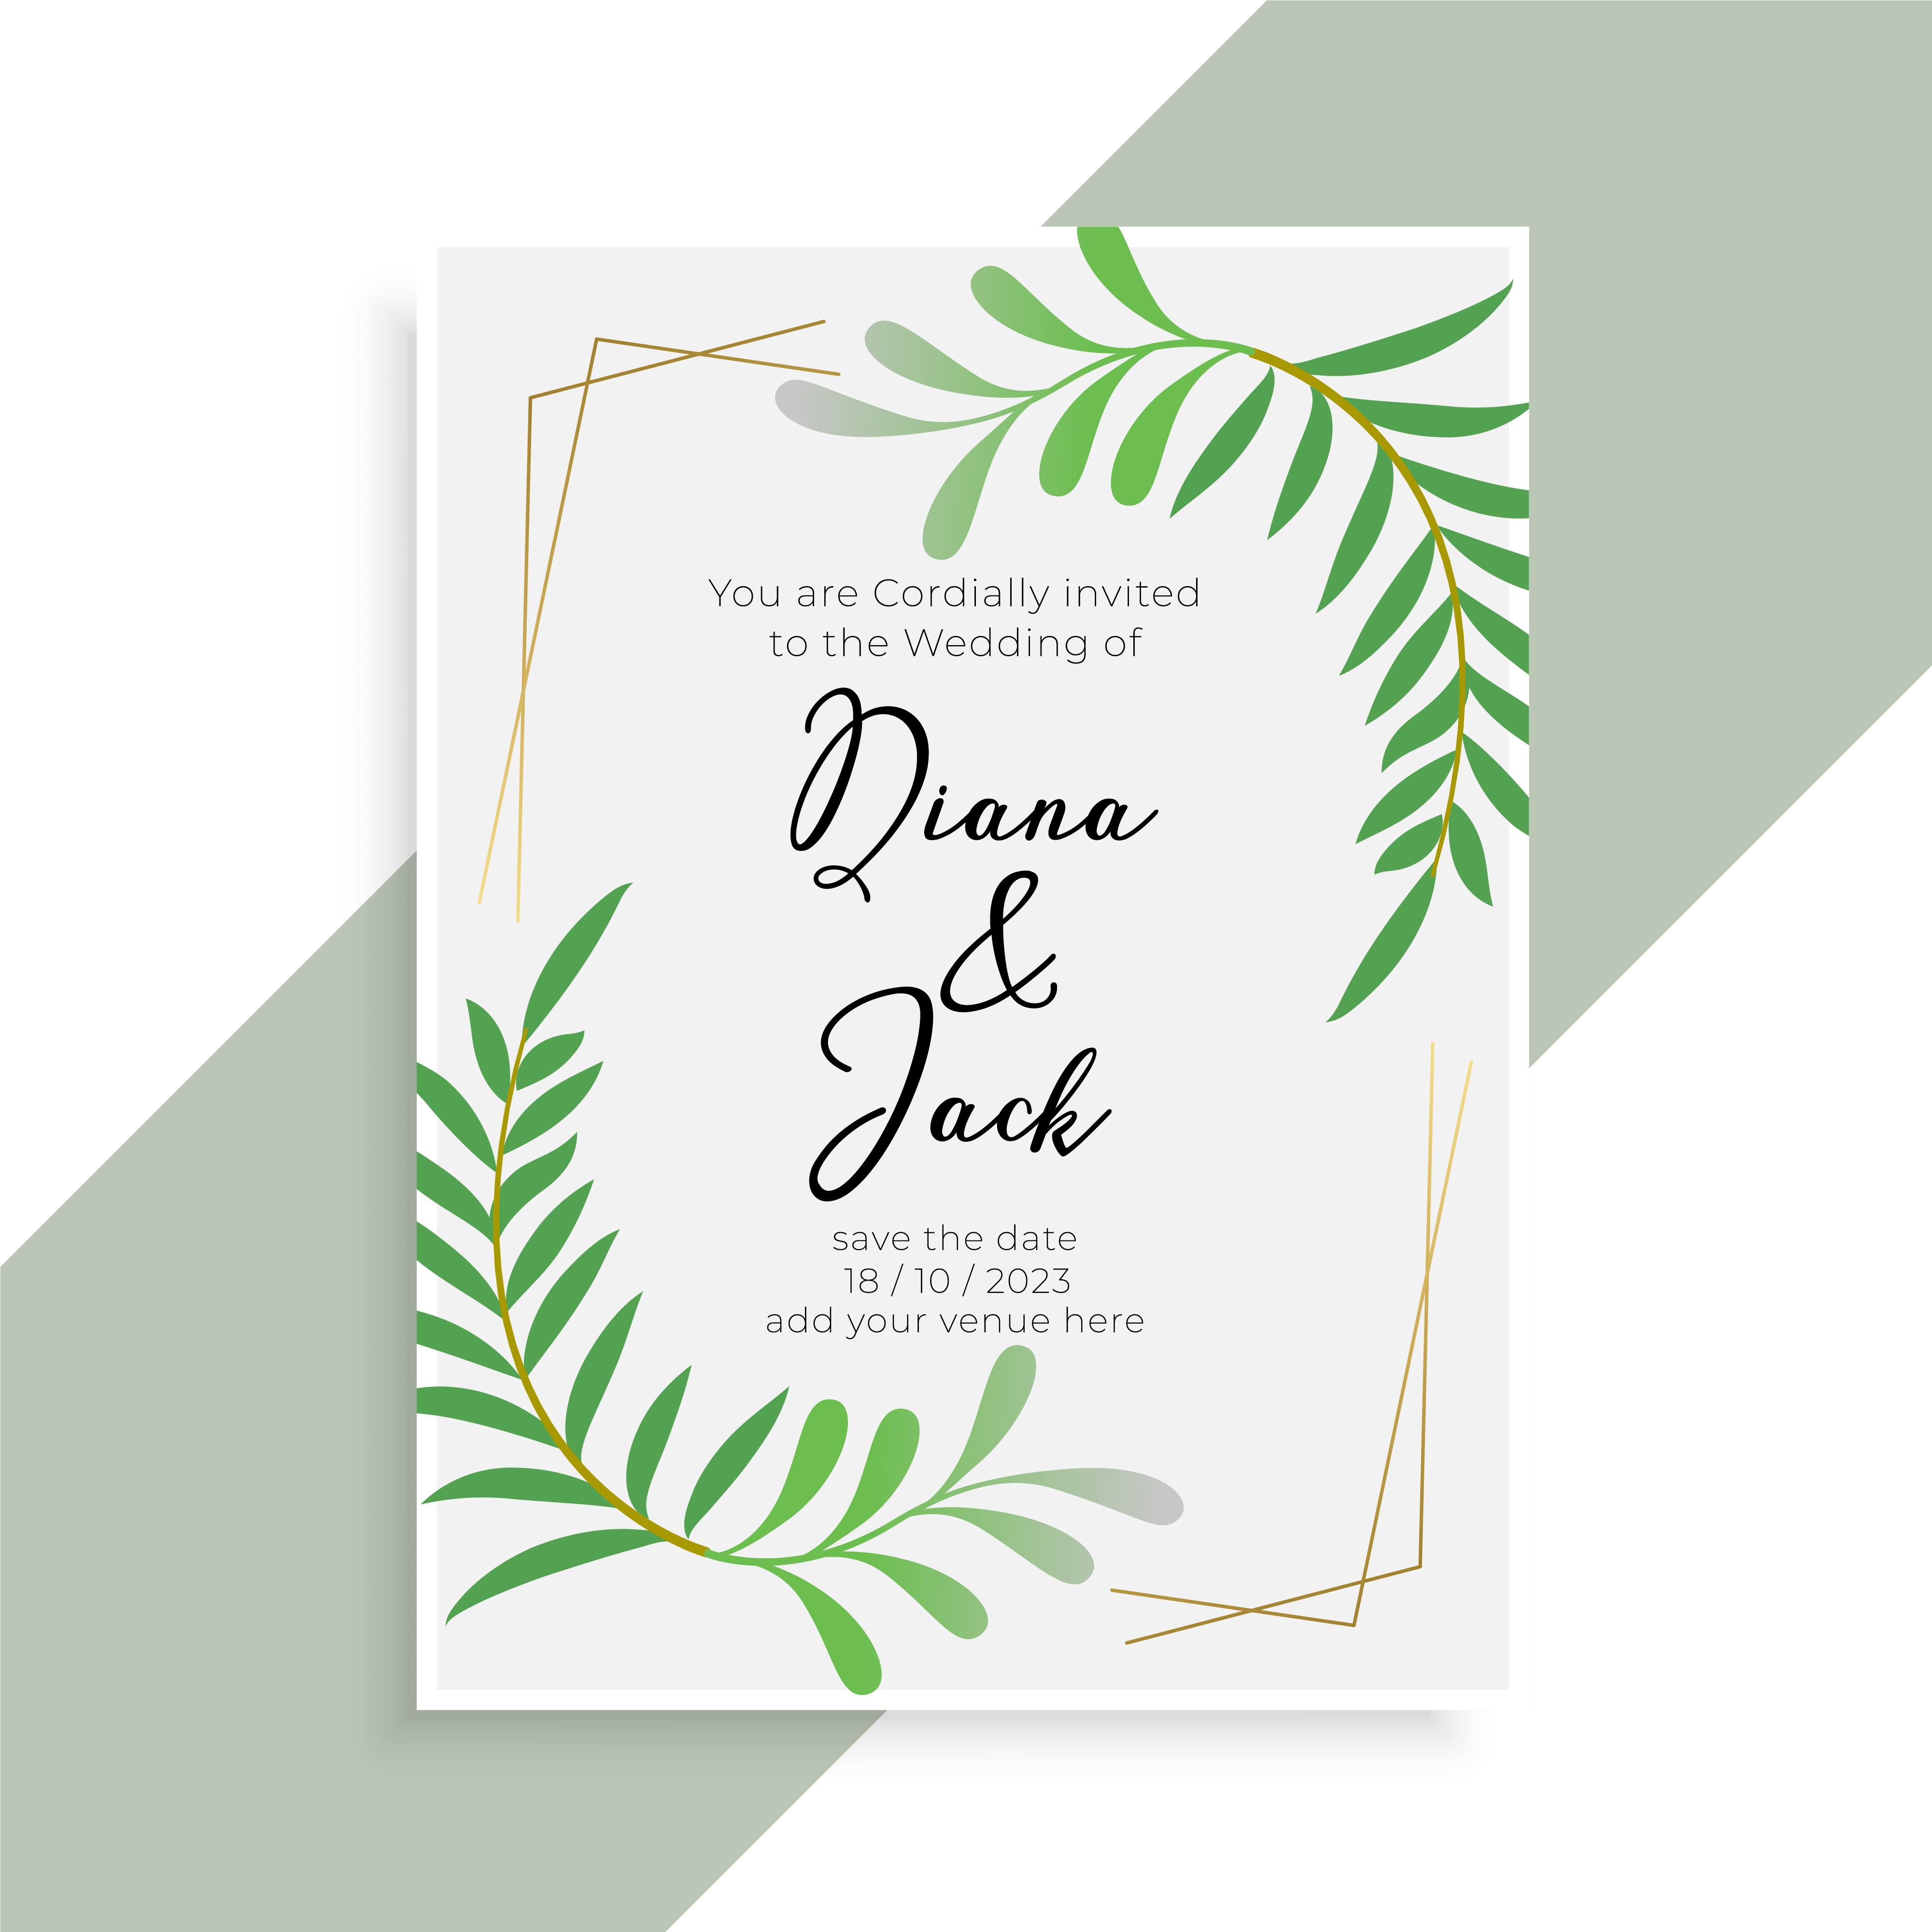 wedding invitation card elegant design Download Free